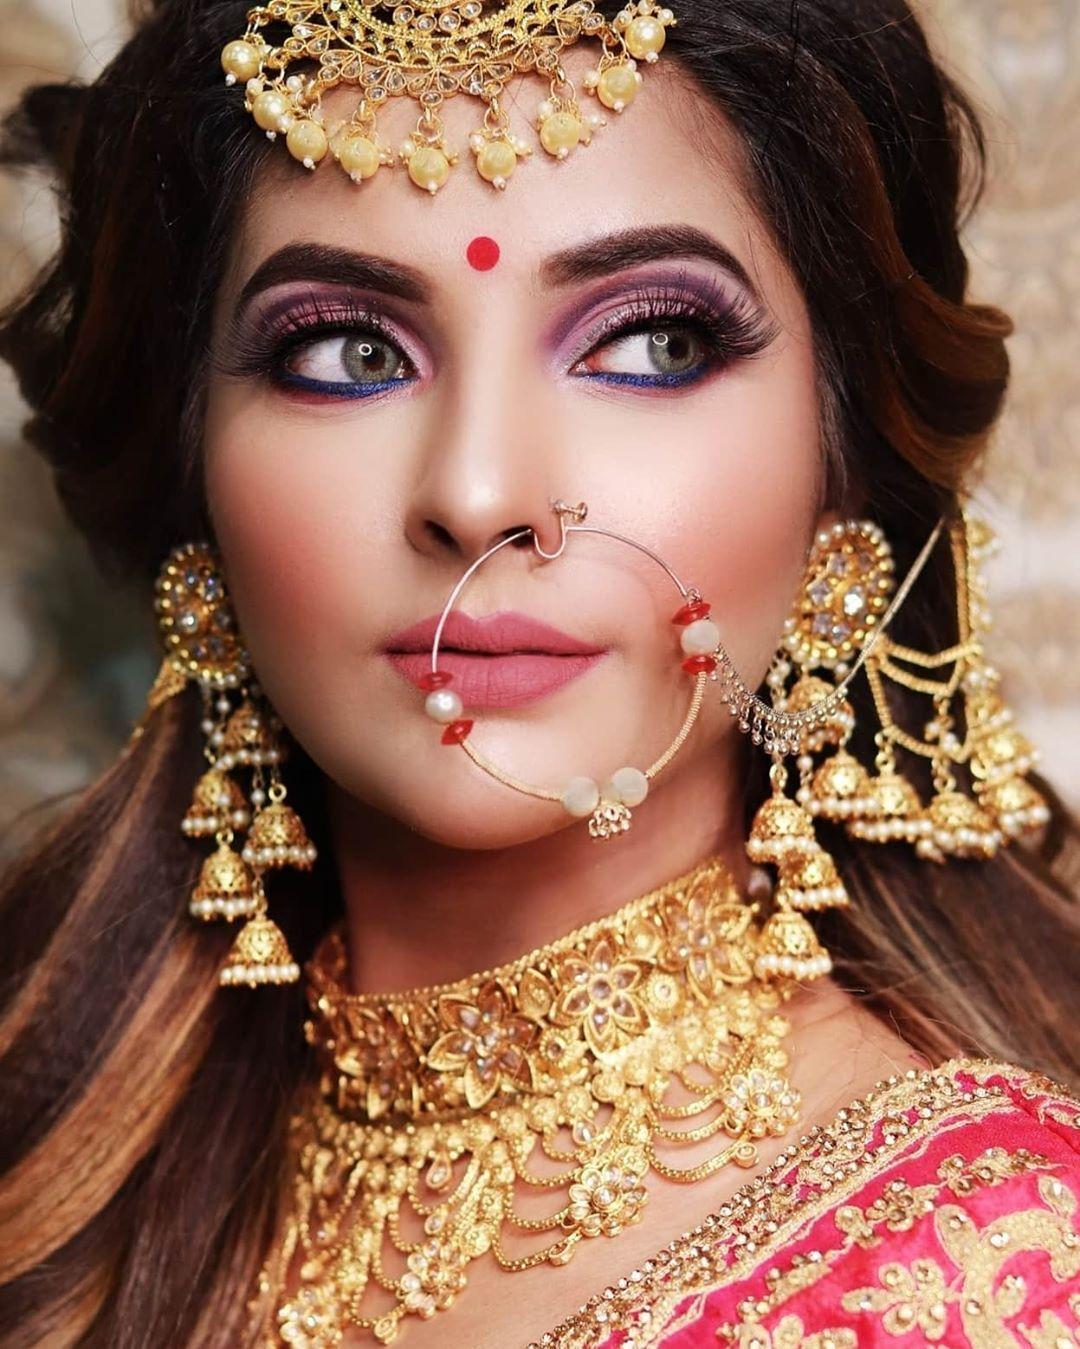 Indian Bridal Look In 2020 Indian Bride Makeup Best Bridal Makeup Bridal Makeup Looks